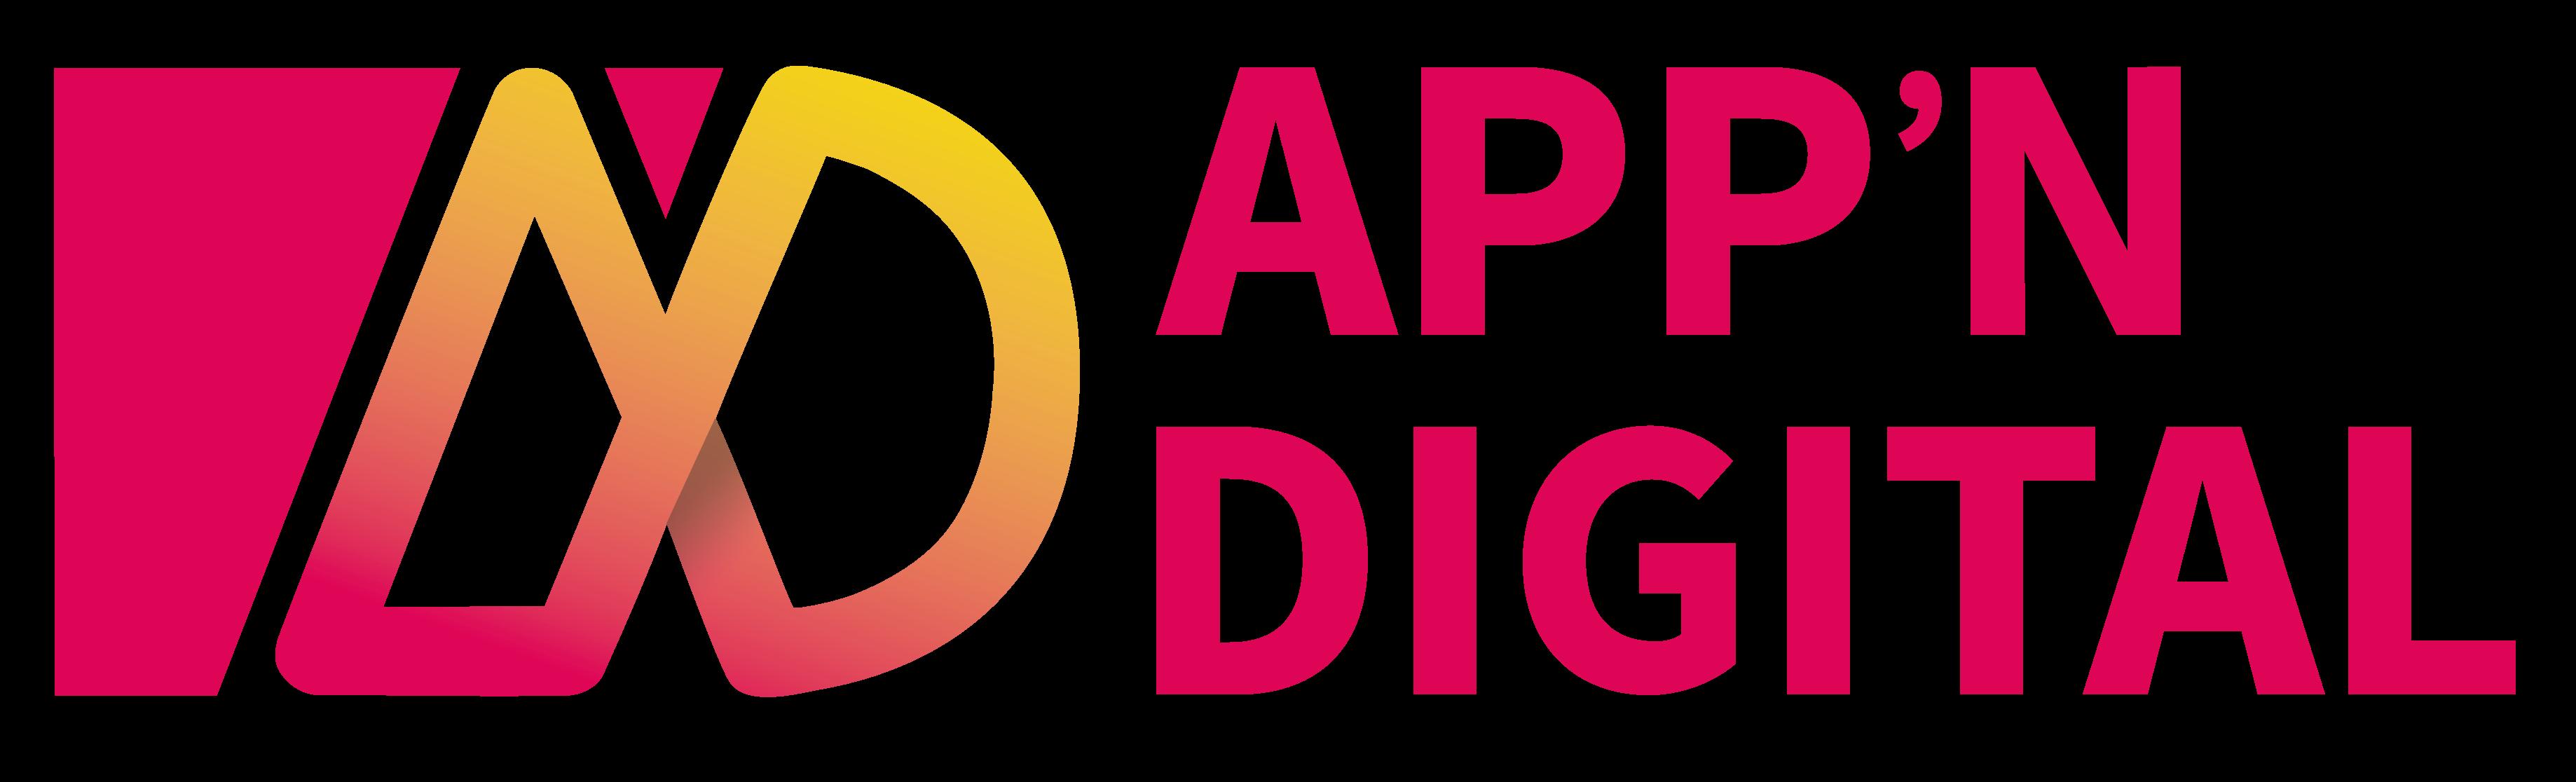 AppNDigital